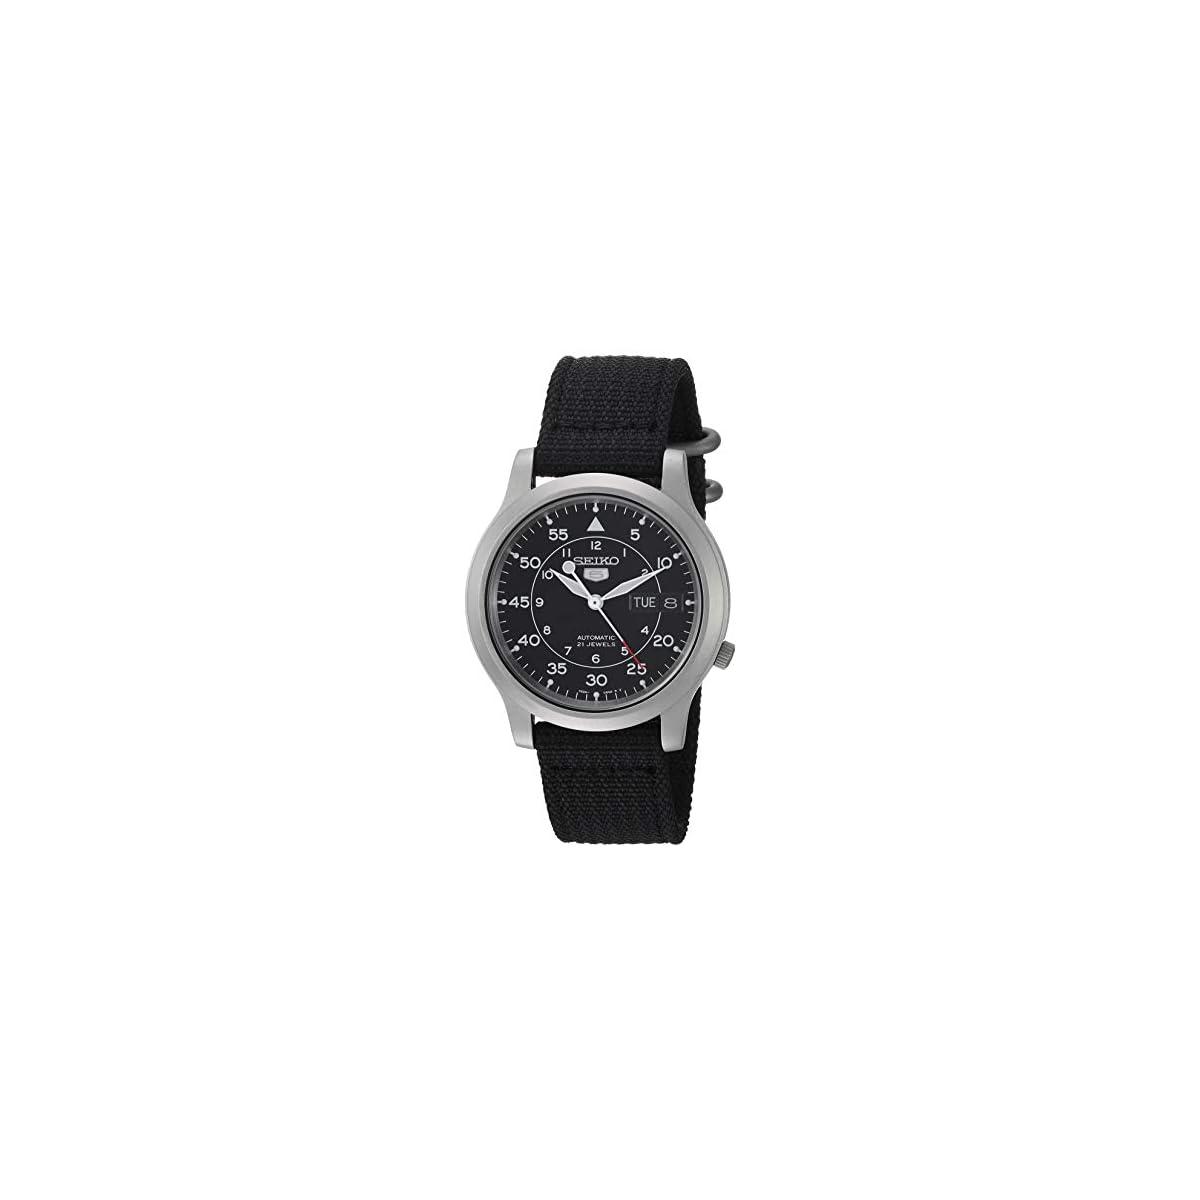 41HrLzfaJhL. SS1200  - Seiko SNK809 - Reloj de Pulsera para Hombre, Negro/Negro